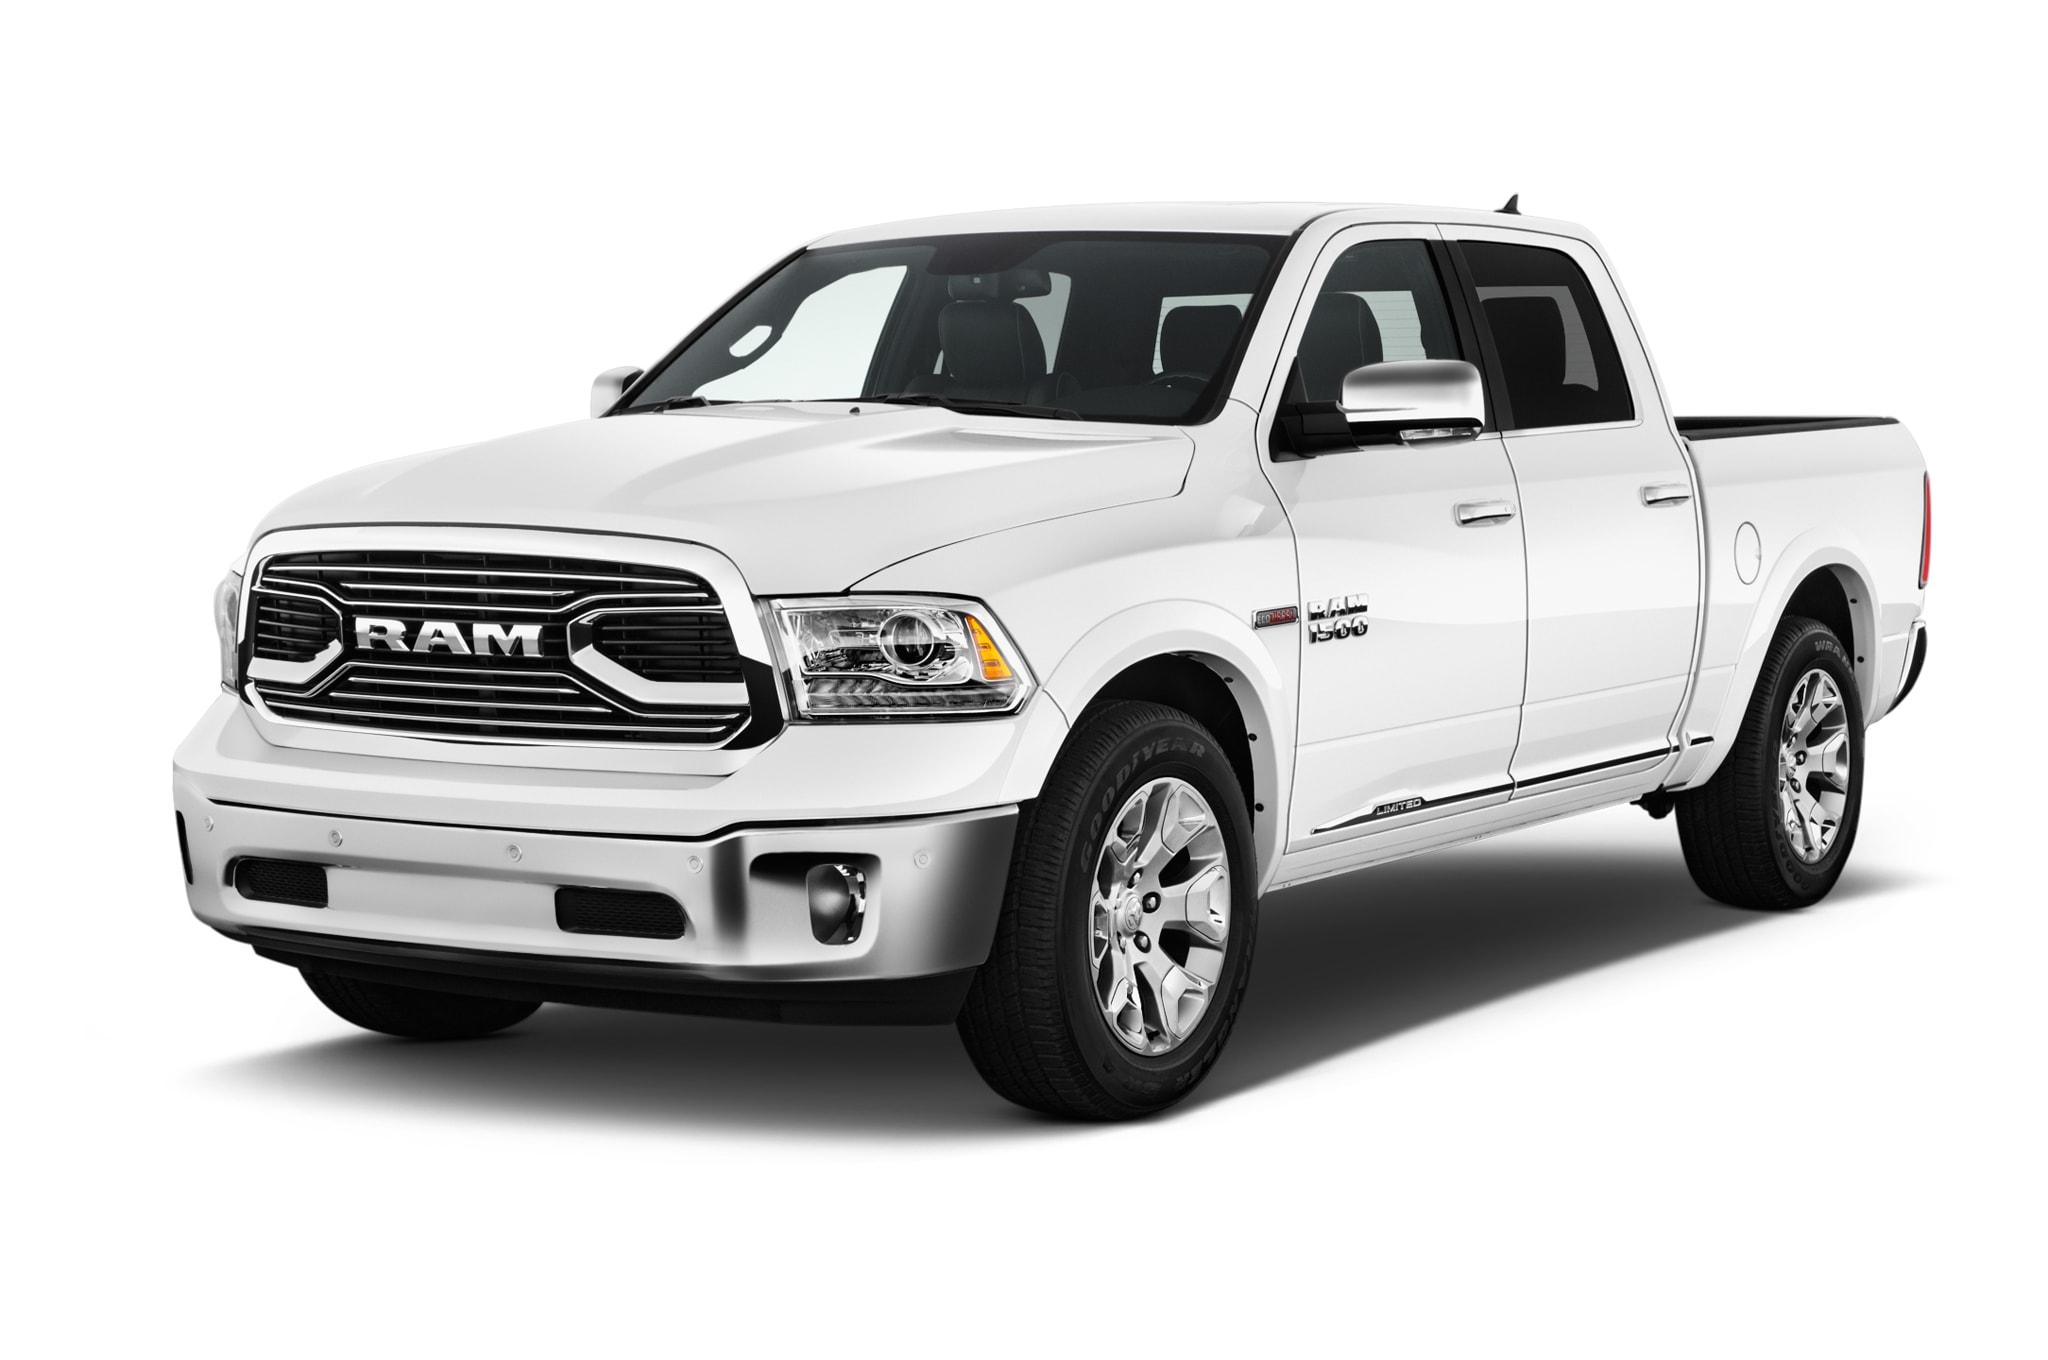 2016 RAM 1500 Best Used Truck